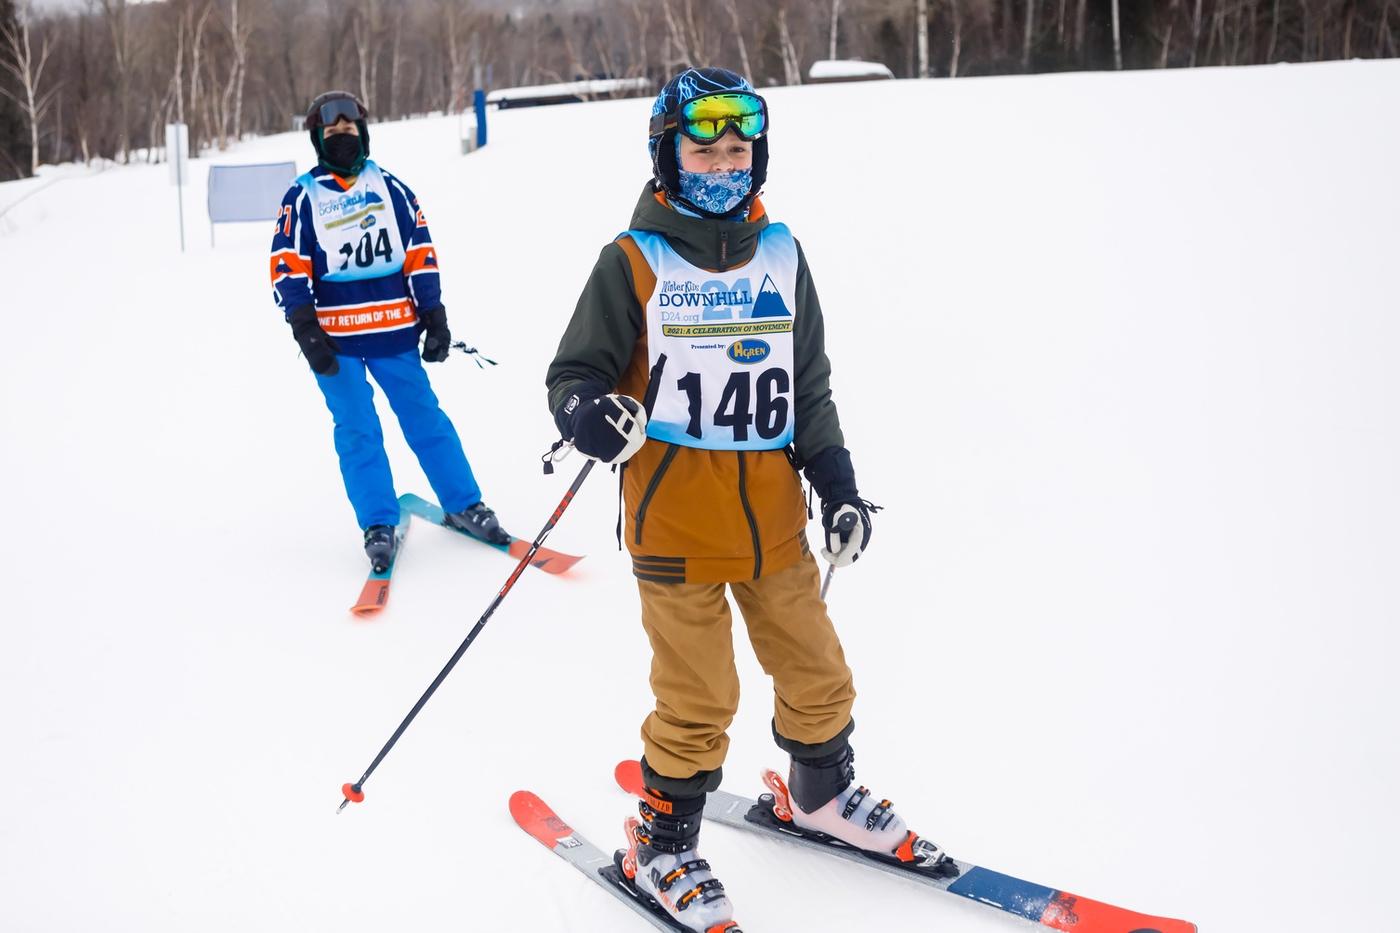 WinterKids Downhill 24 2021 SDP 2639